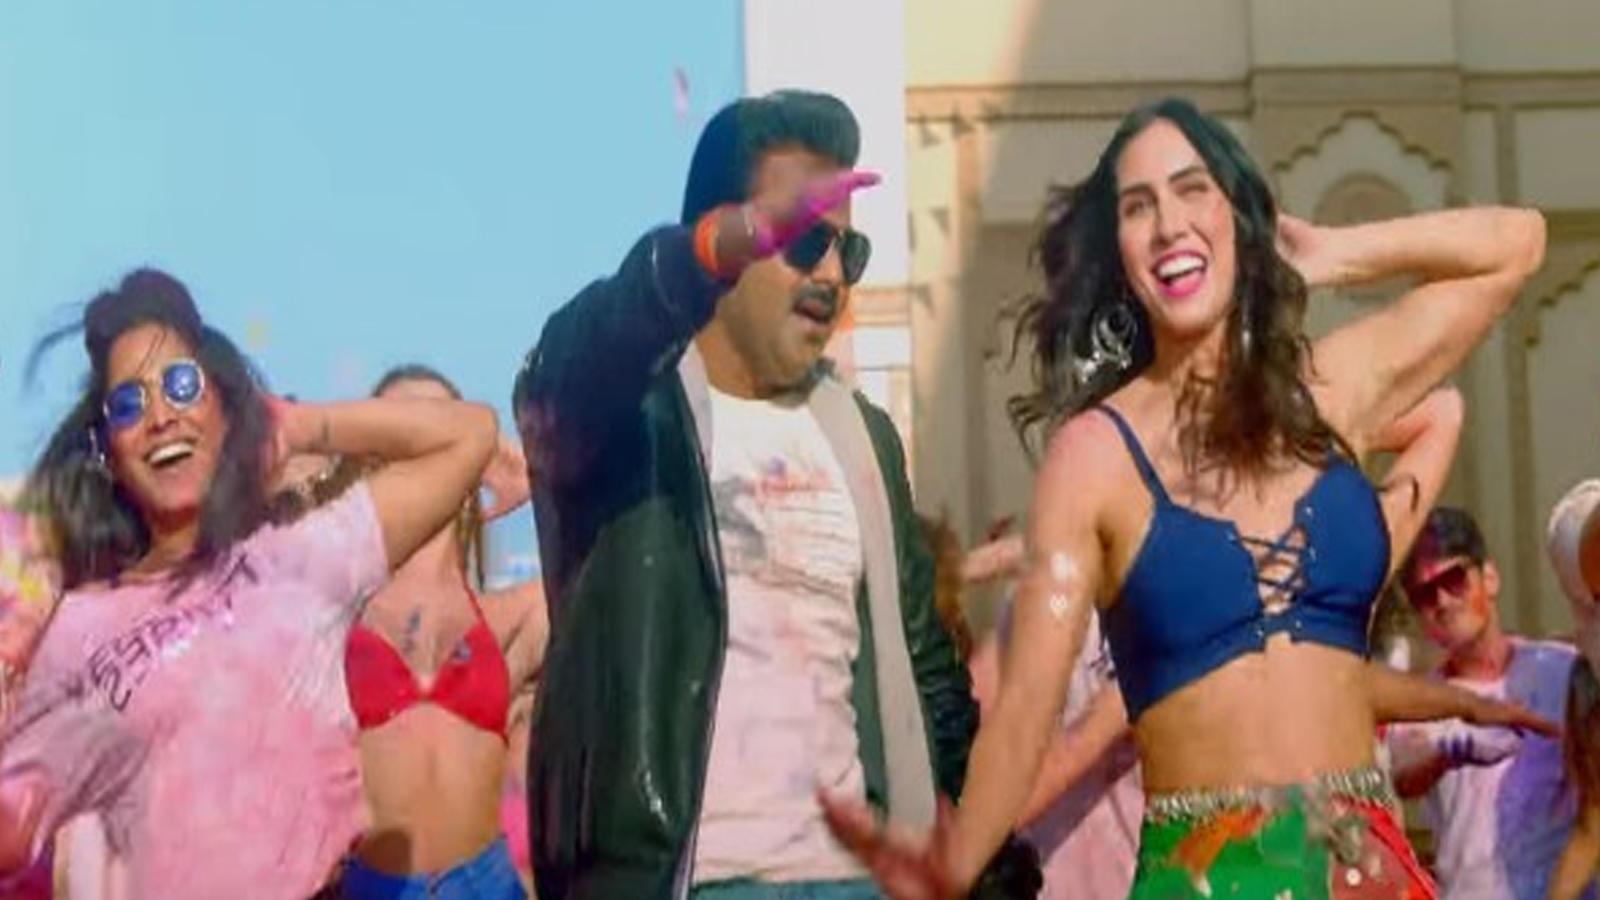 pawan-singhs-latest-video-album-kamariya-hila-rahi-hai-with-lauren-gottlieb-breaks-record-singer-posts-a-heart-whelming-video-for-fans